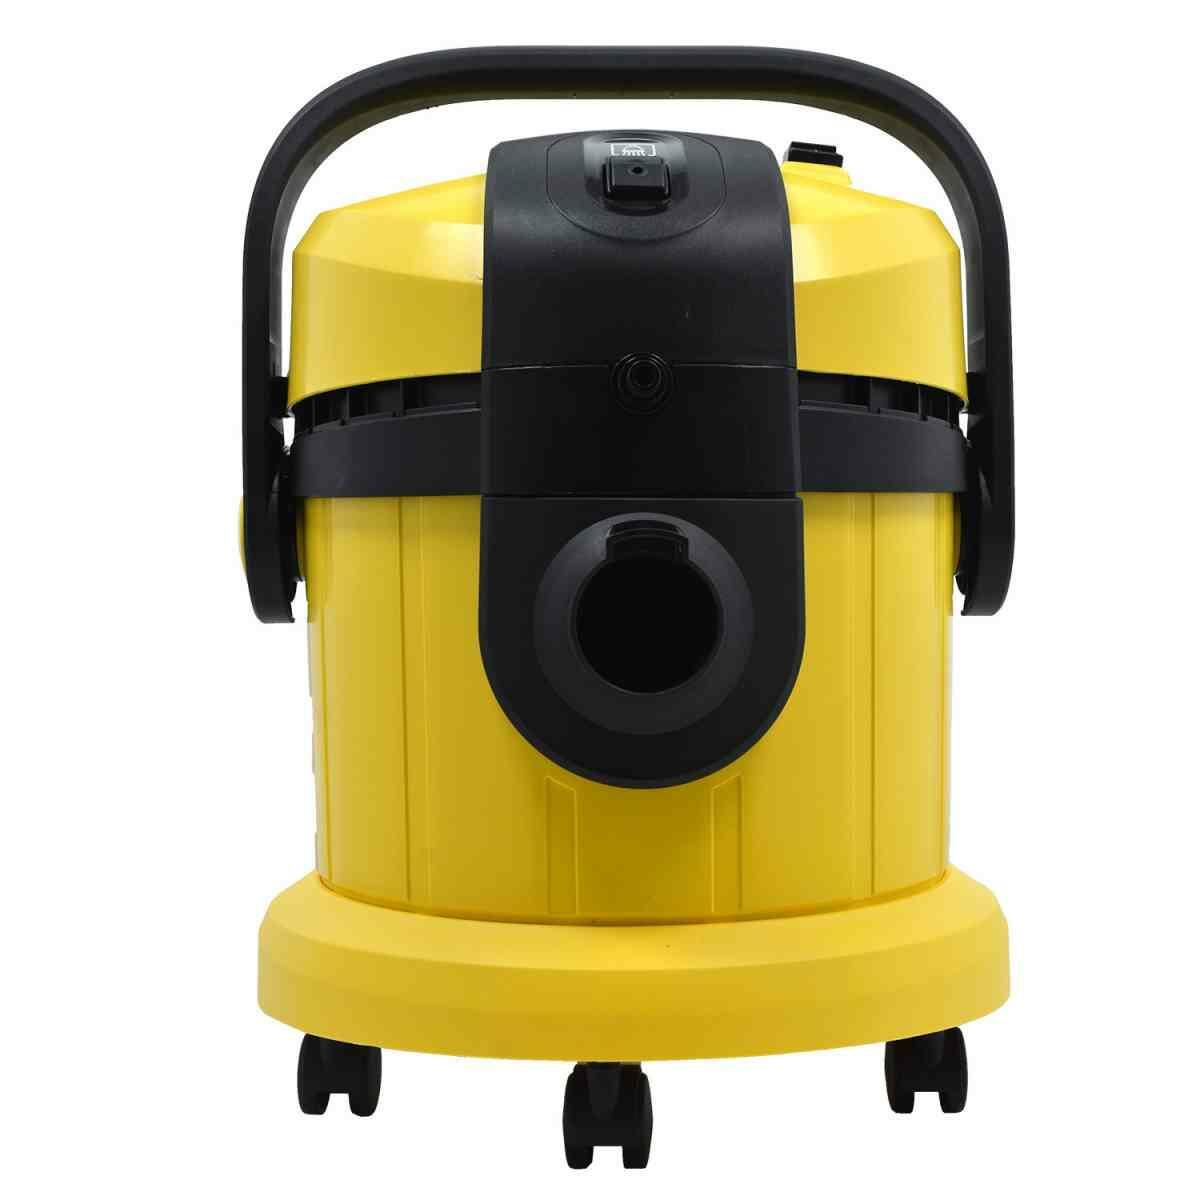 Extratora 1400W SE4001 Karcher Com Detergente Bumafer 220V